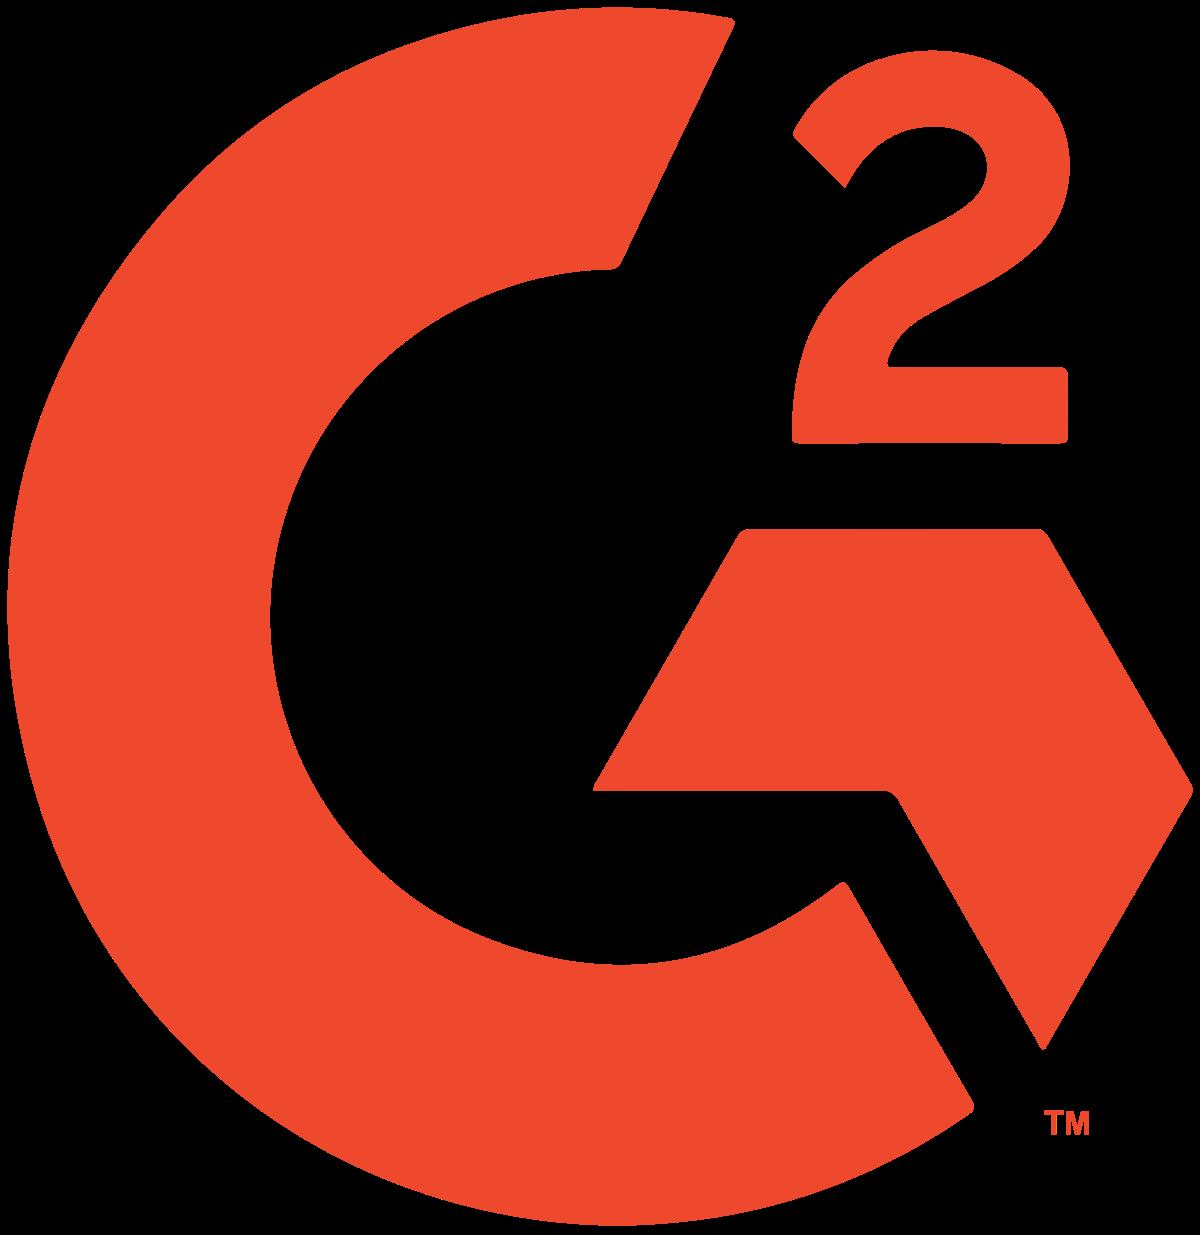 G2 Crowd - Wikipedia